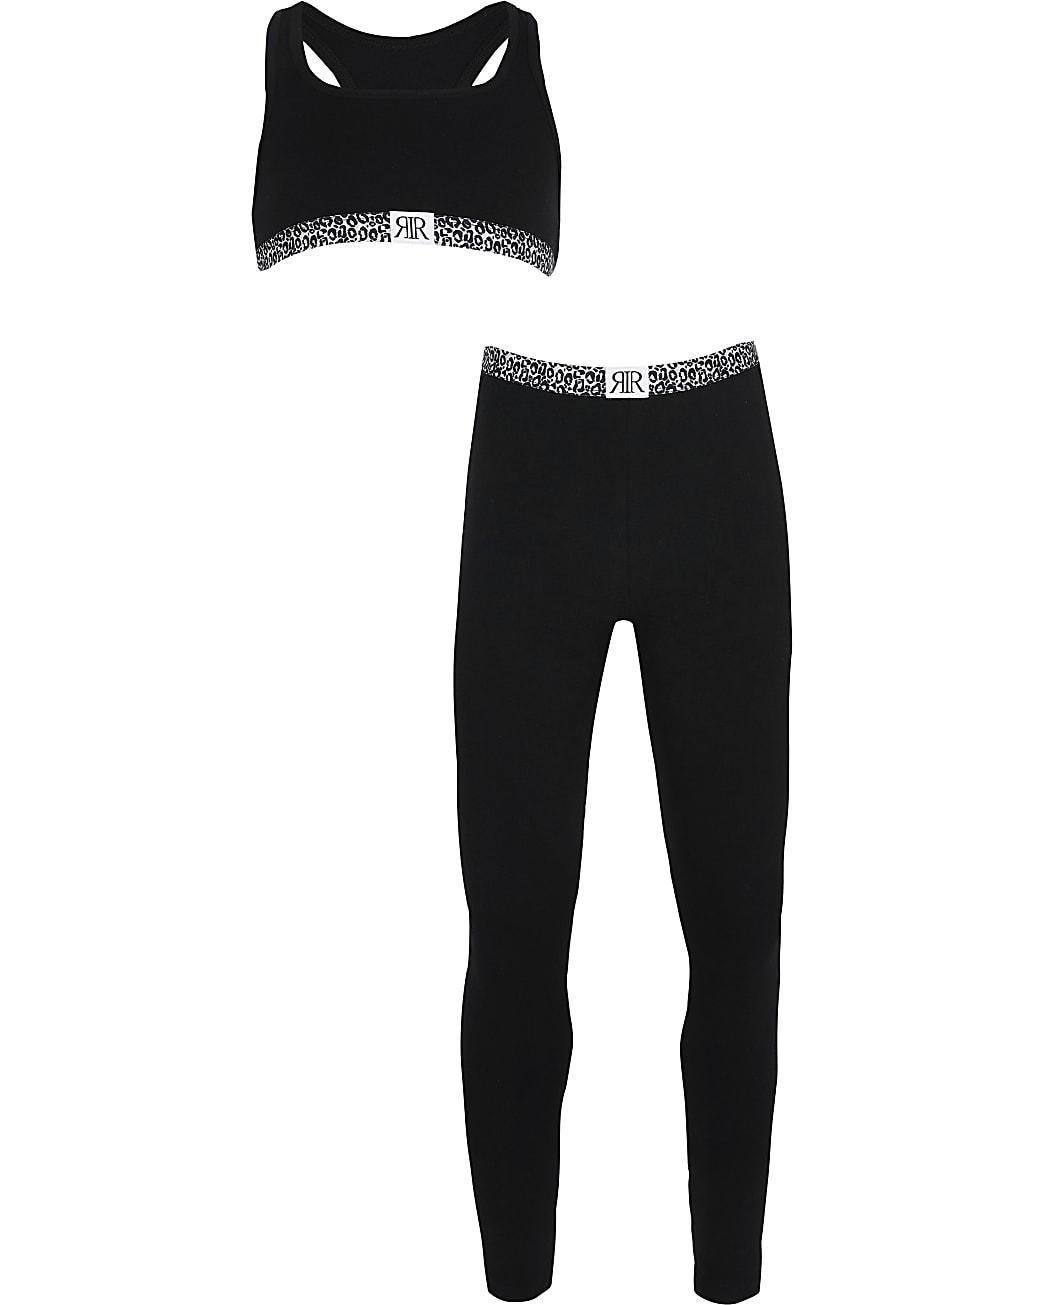 Girls black animal print leggings outfit